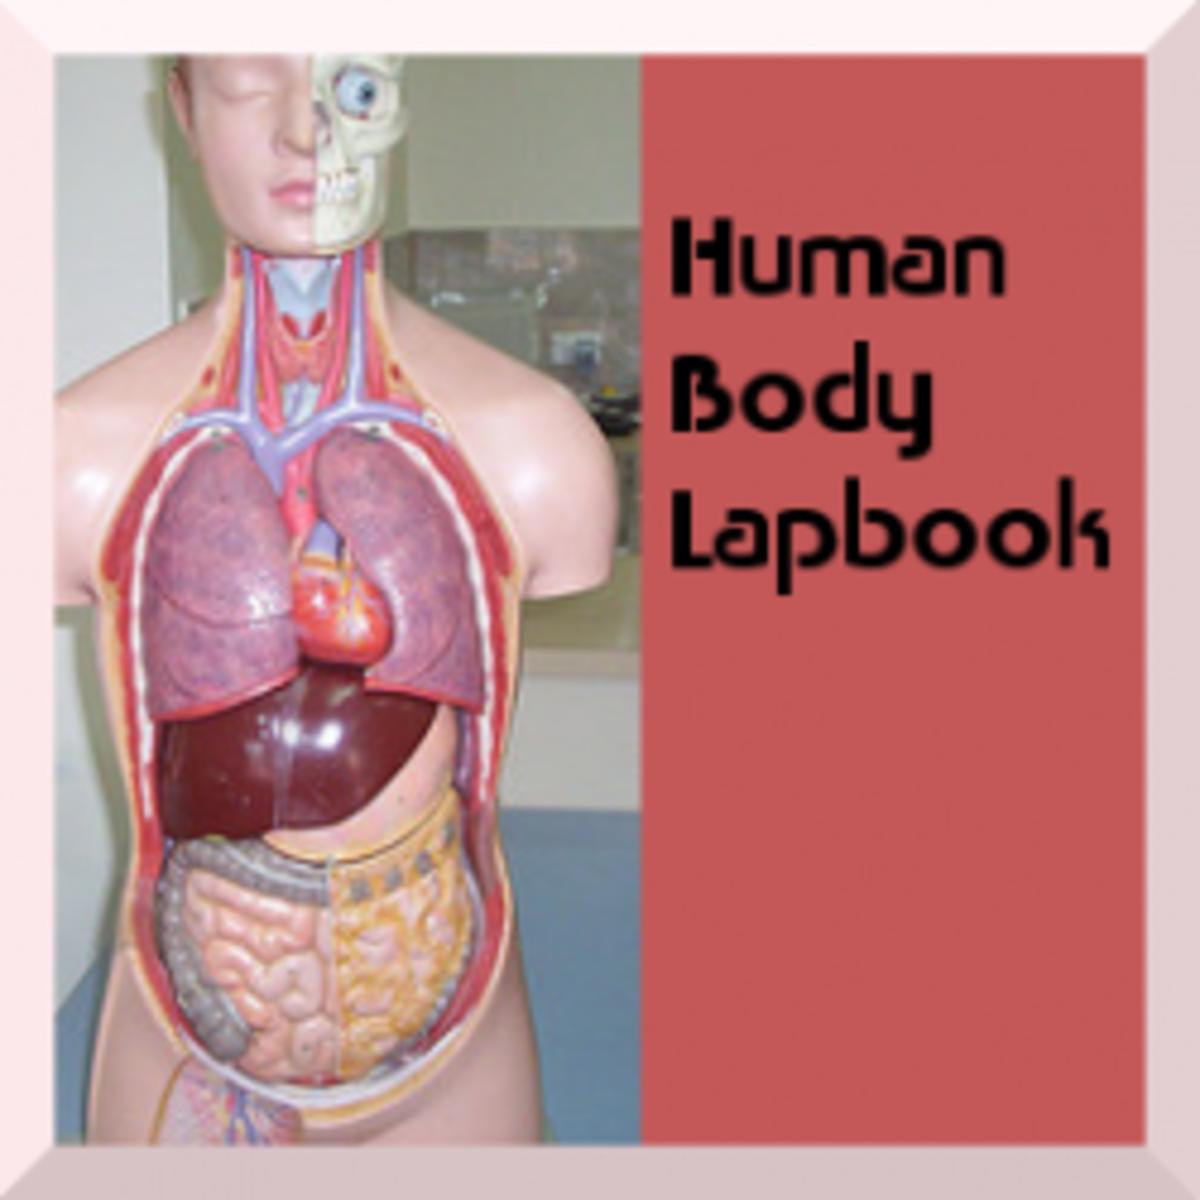 humanbodylapbook